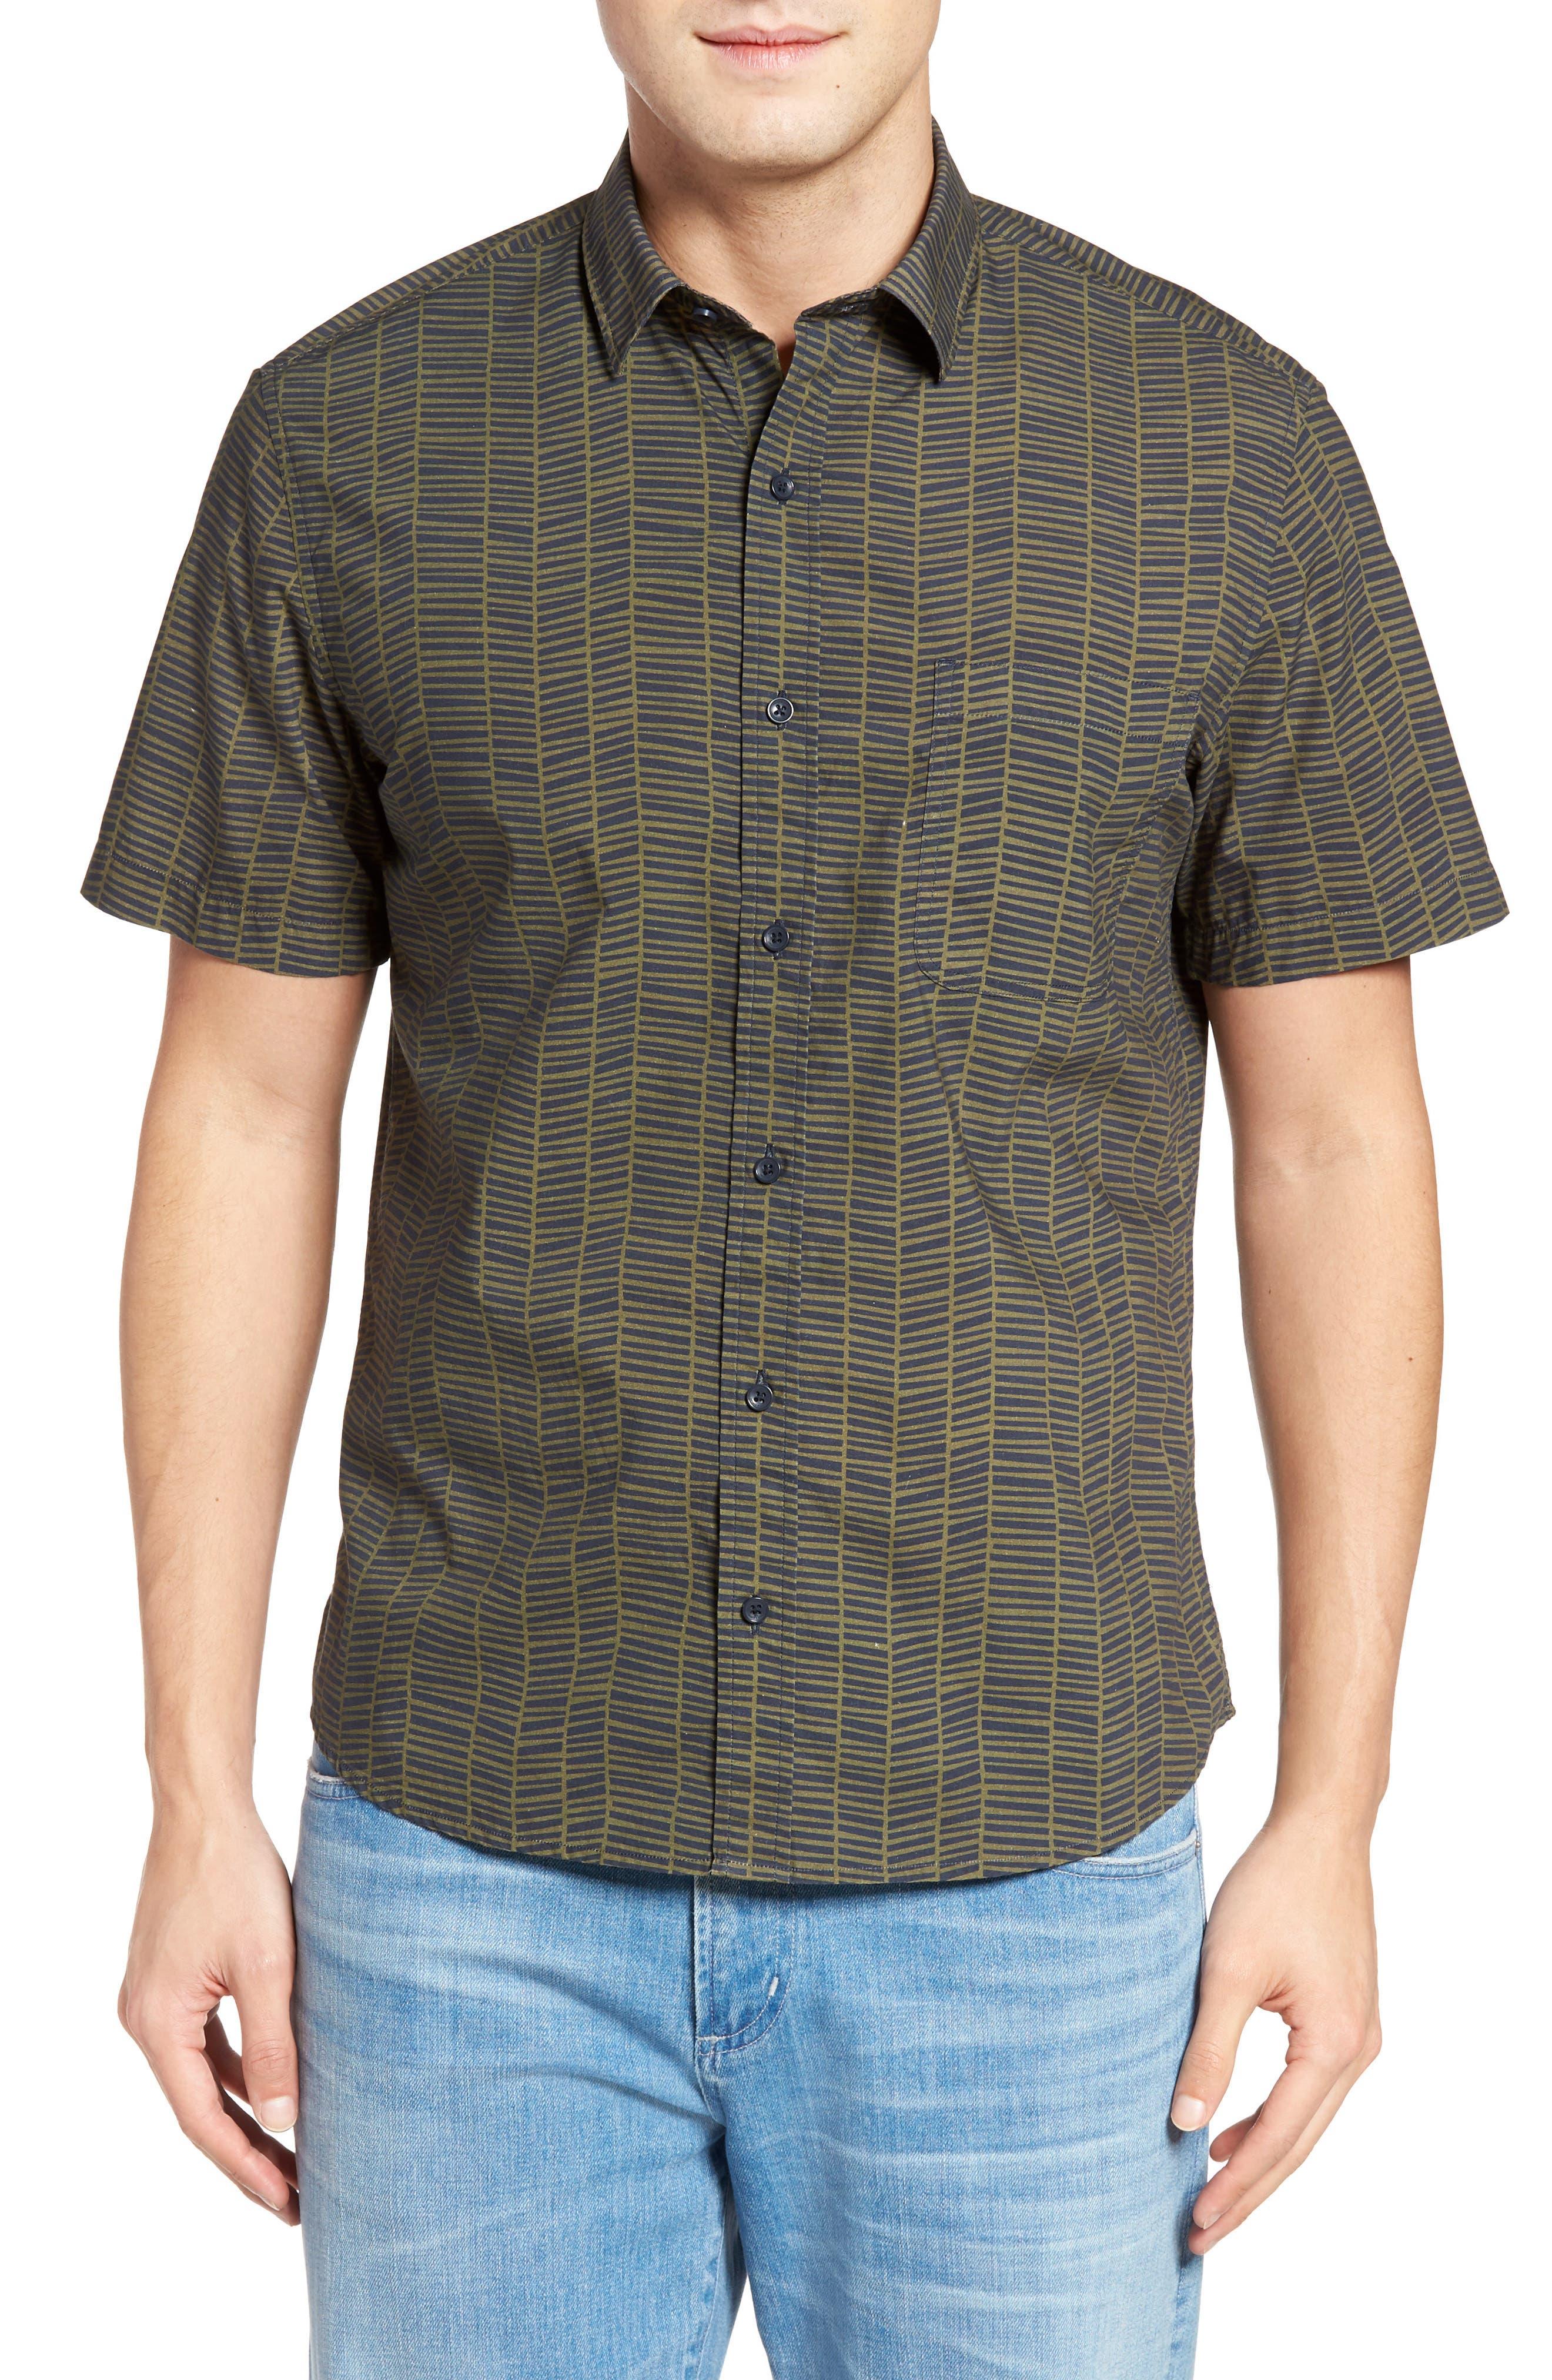 Maker & Company Palm Herringbone Print Sport Shirt